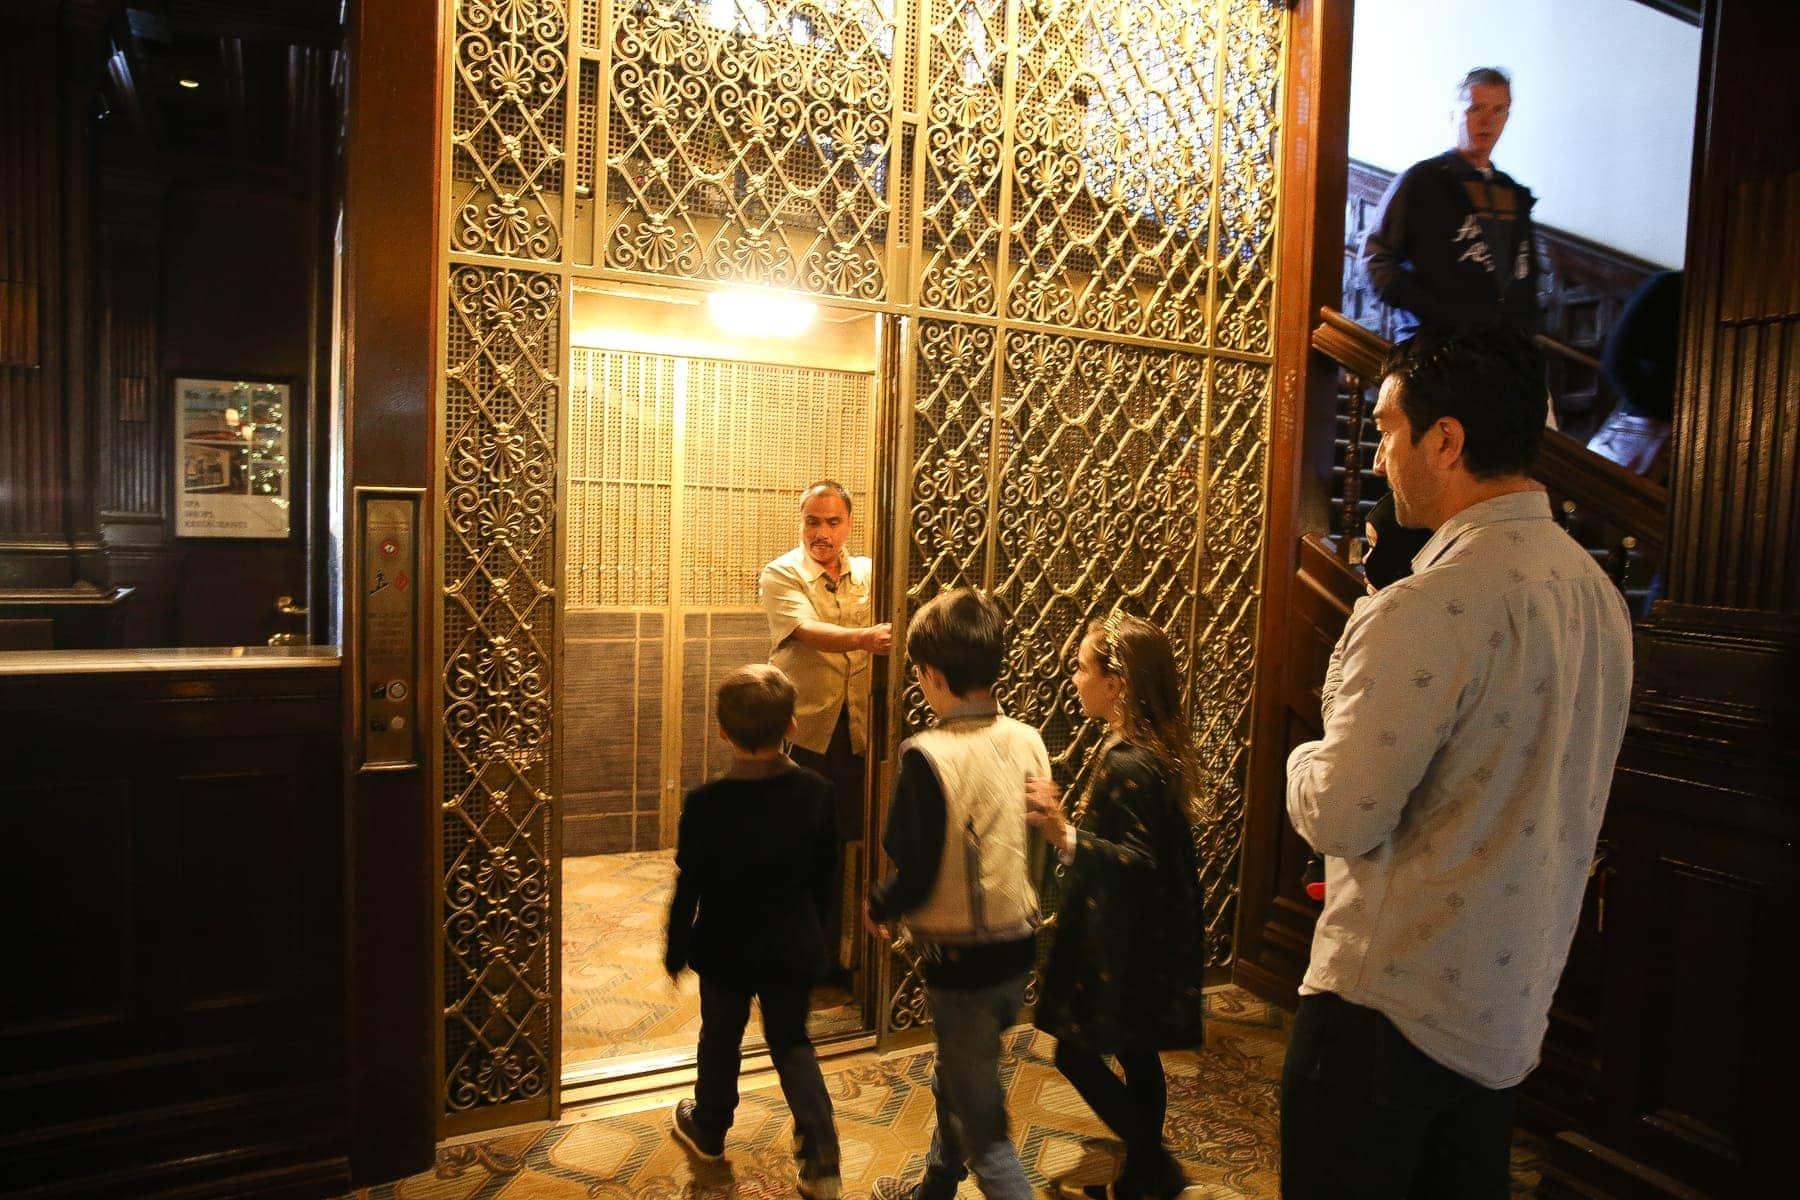 kids in old hotel elevator